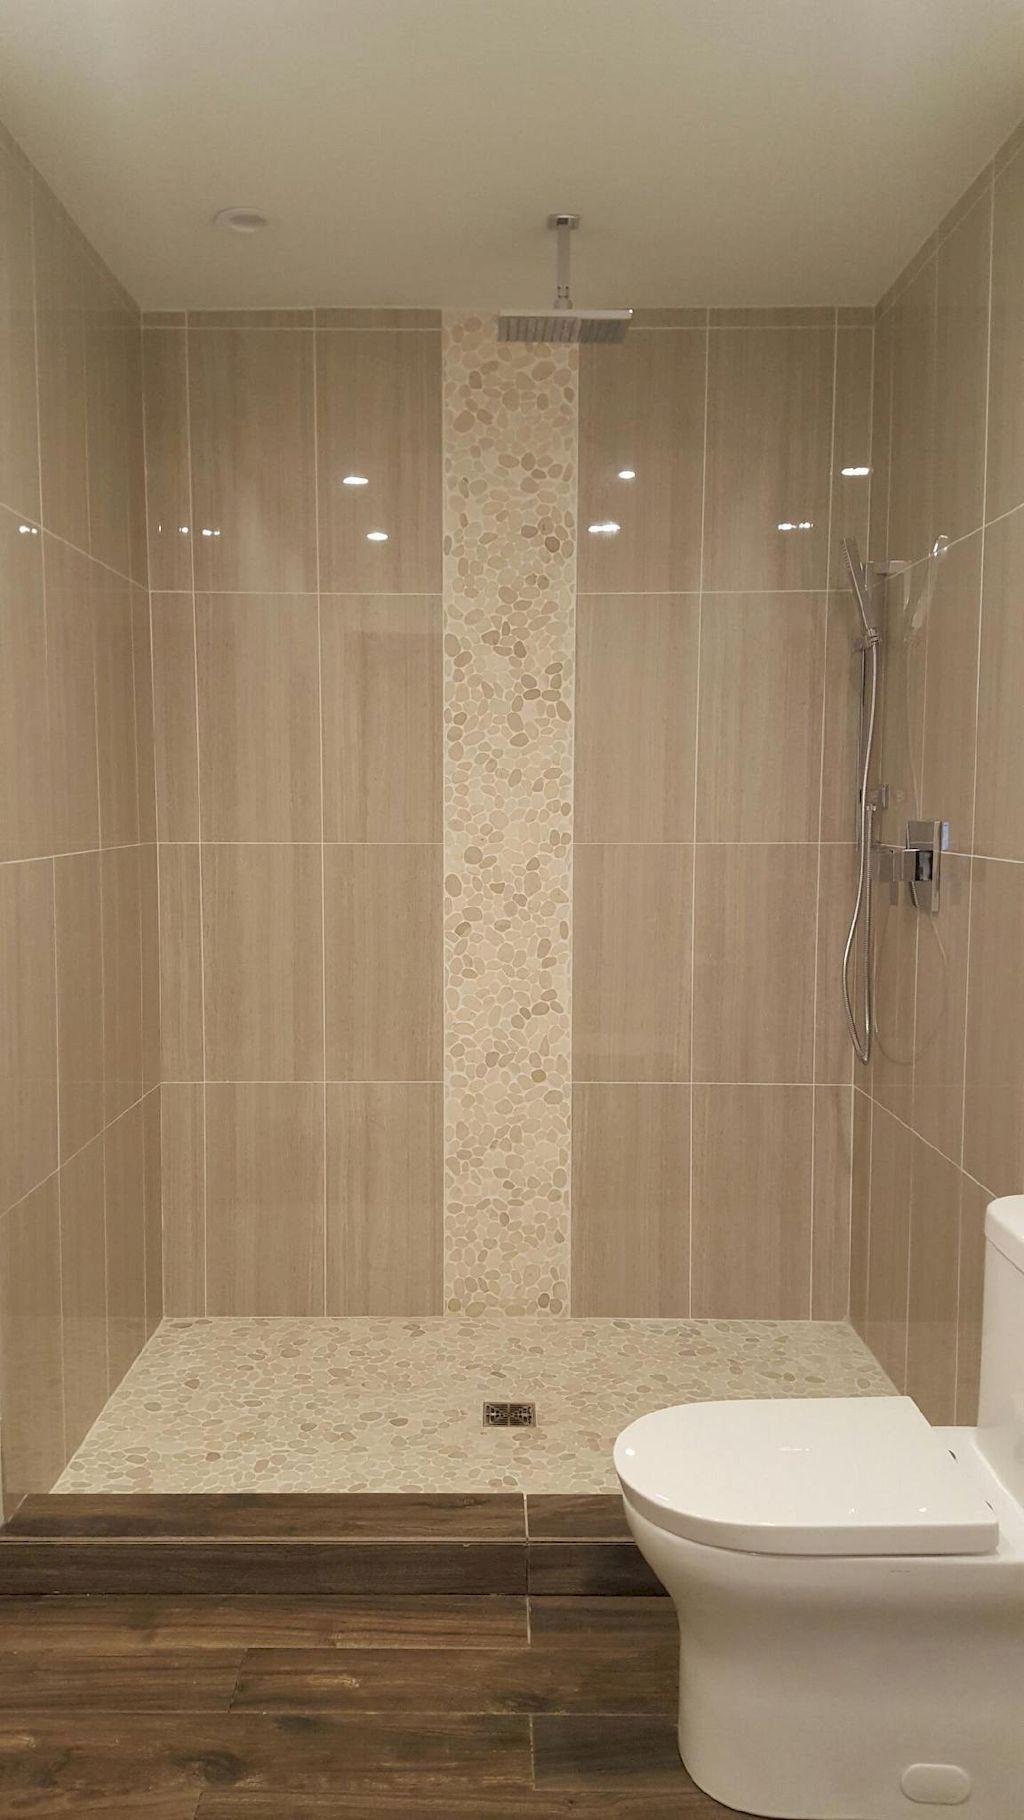 80 stunning tile shower designs ideas for bathroom remodel rh pinterest com